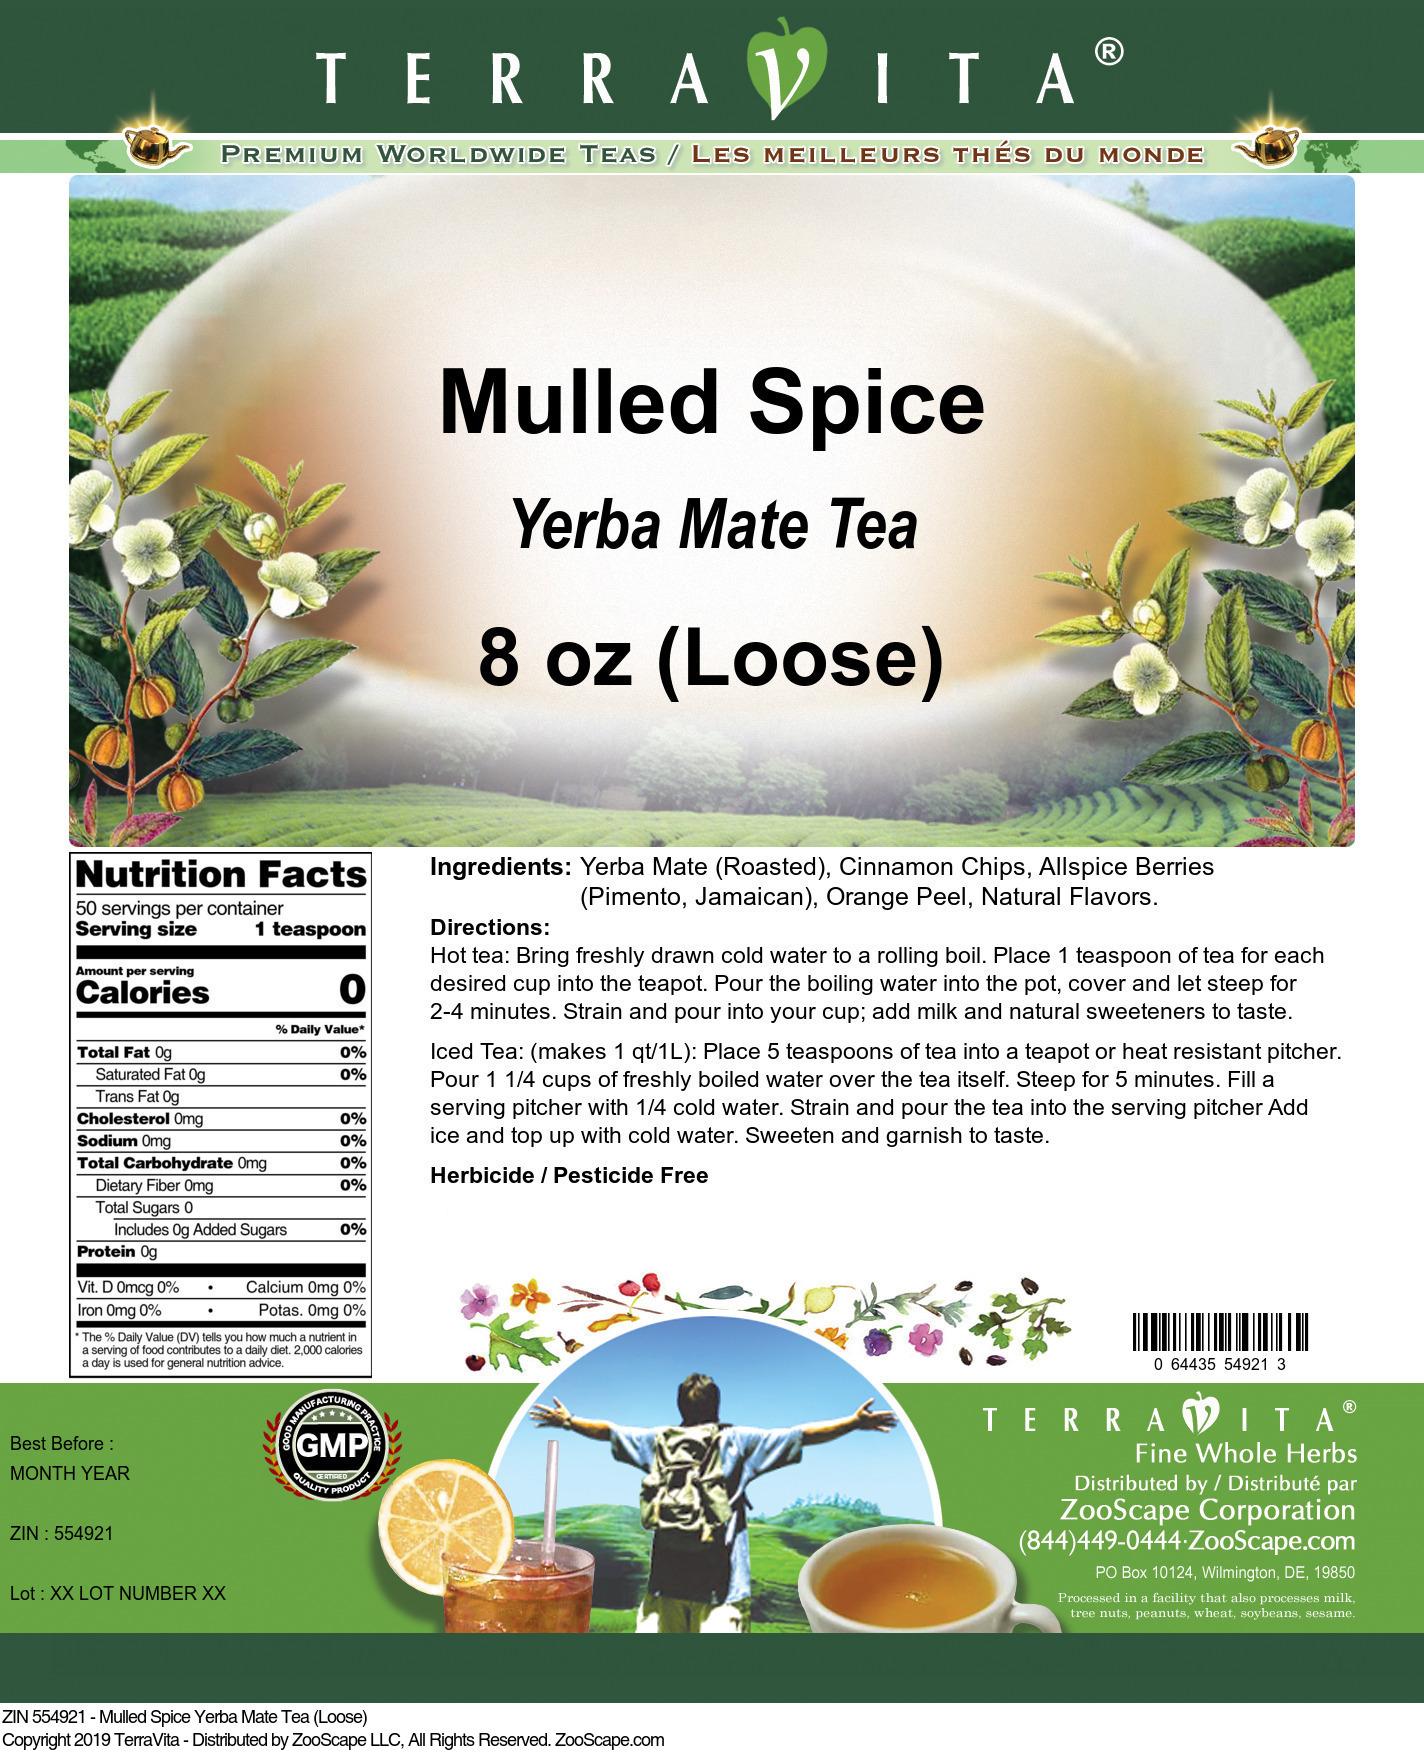 Mulled Spice Yerba Mate